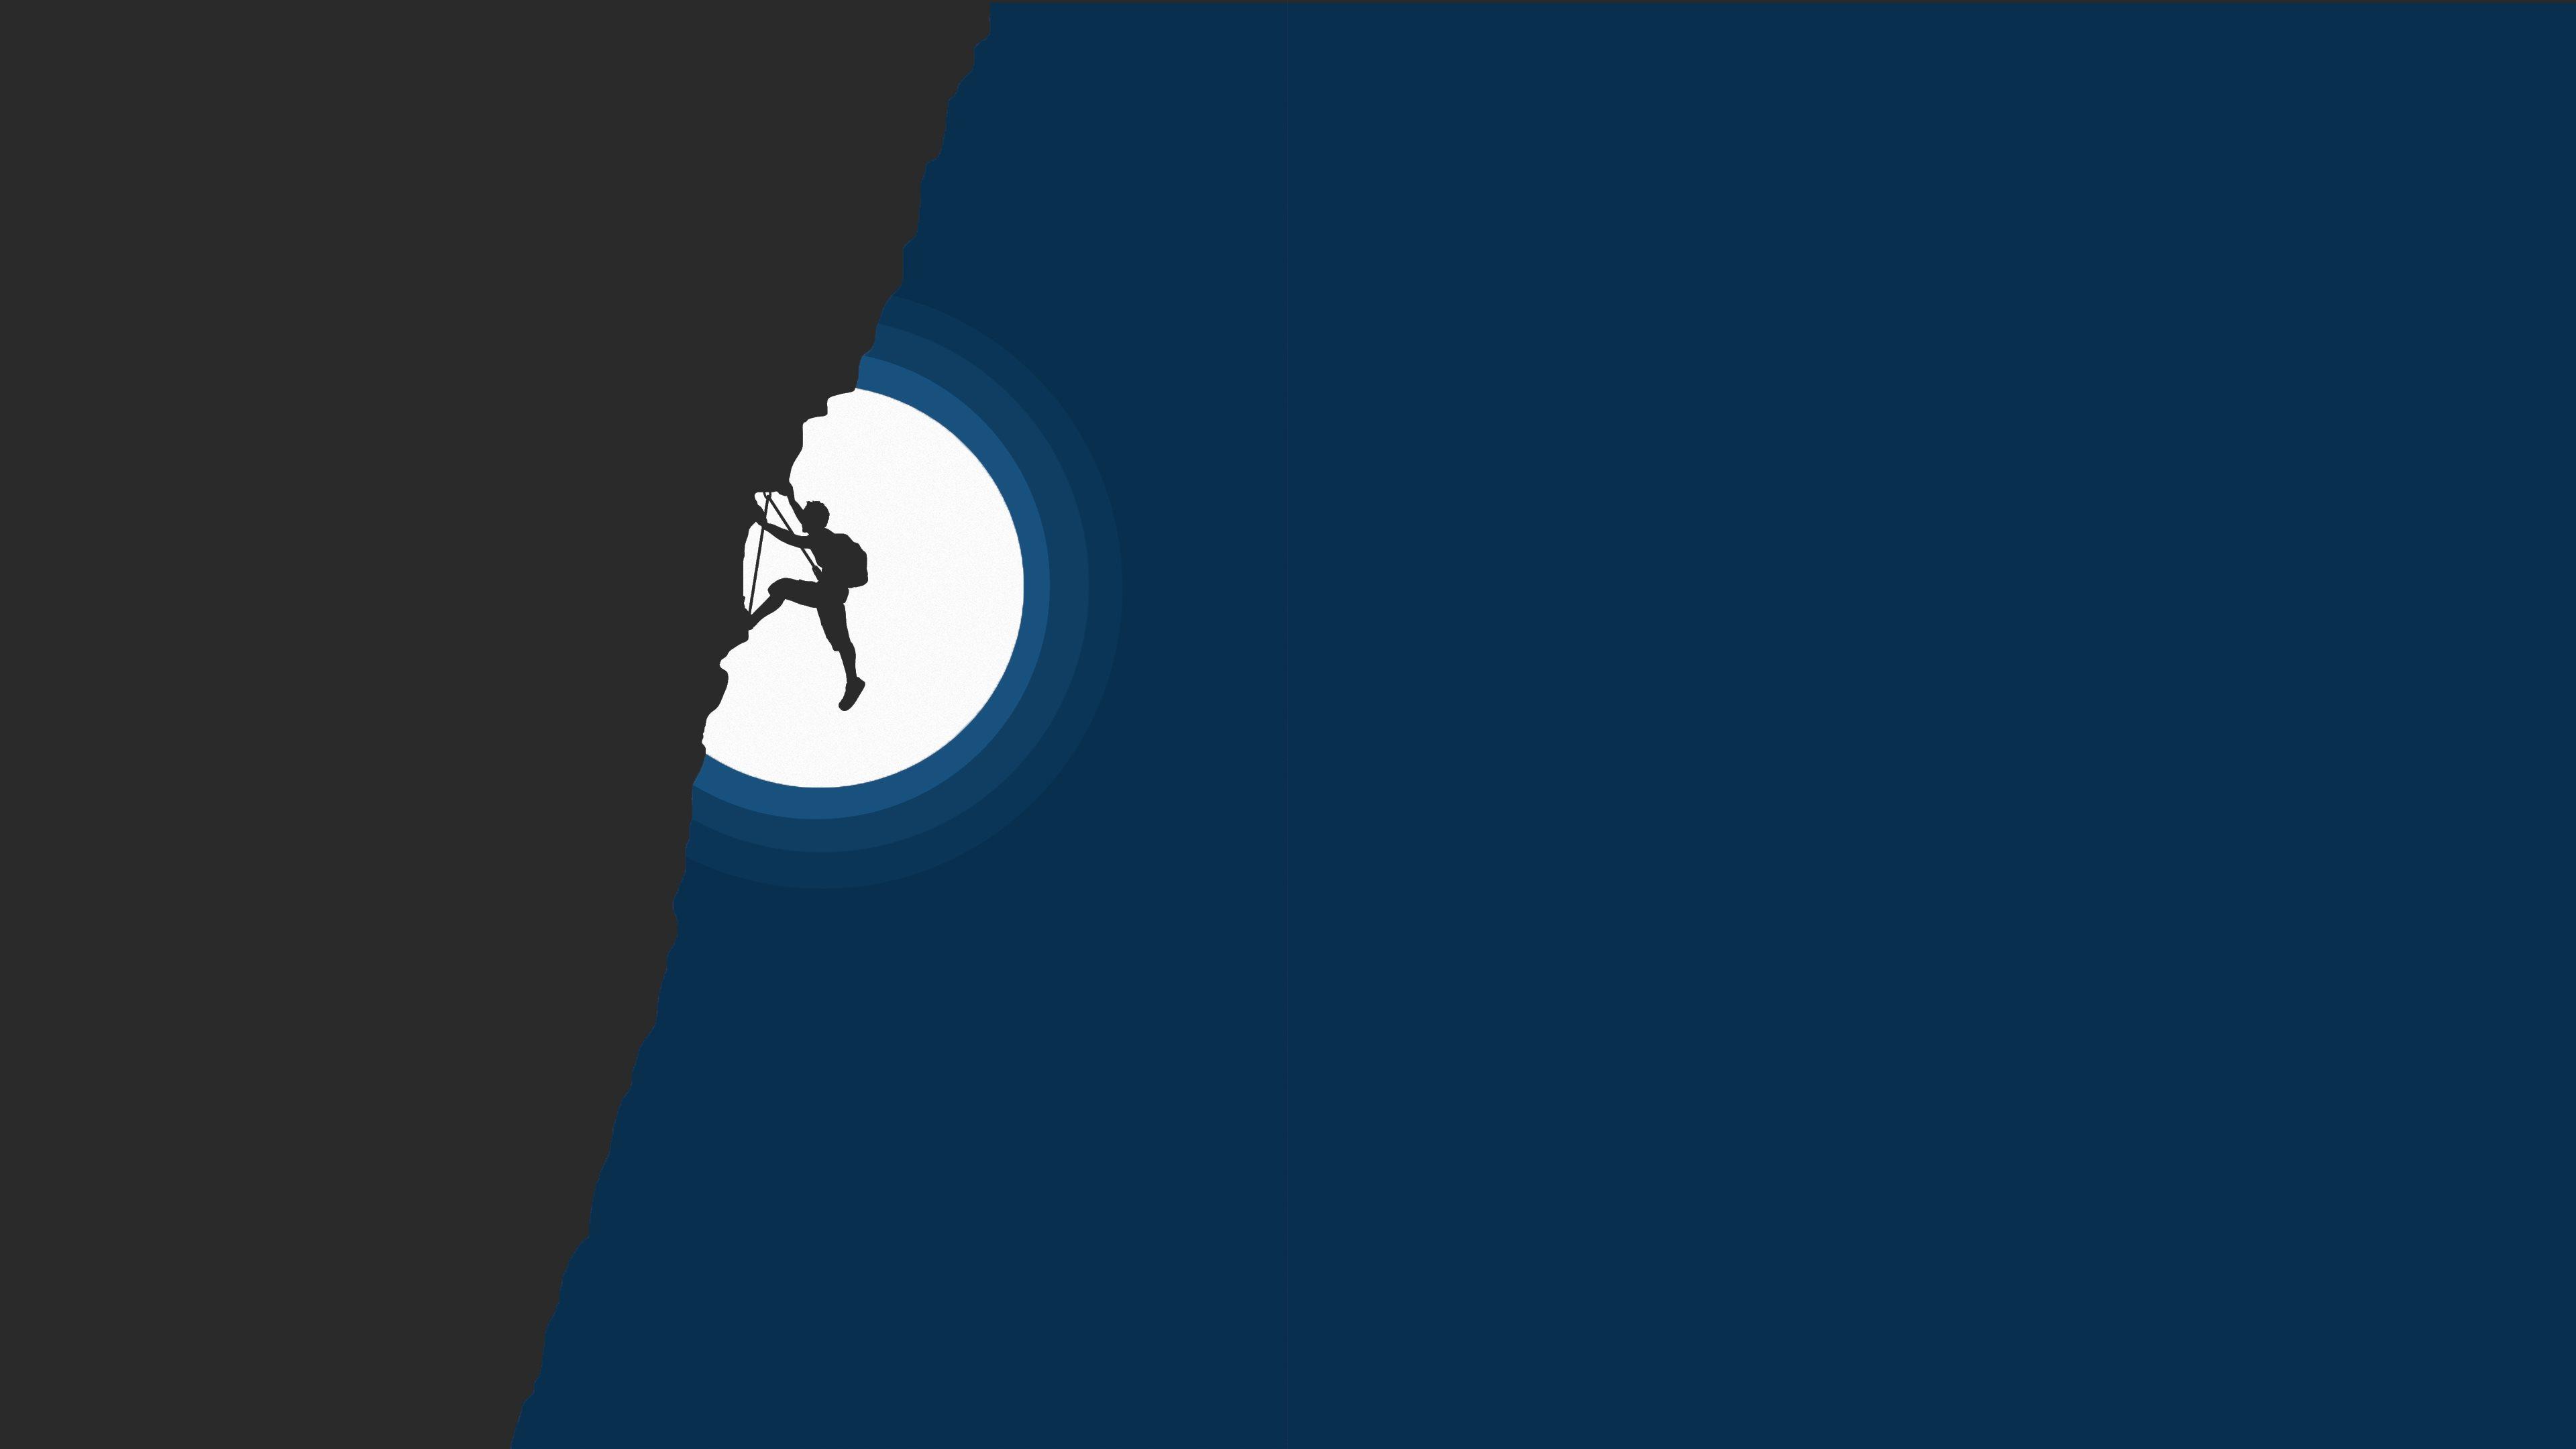 General 3840x2160 hiking illustration night minimalism digital art mountains climbing